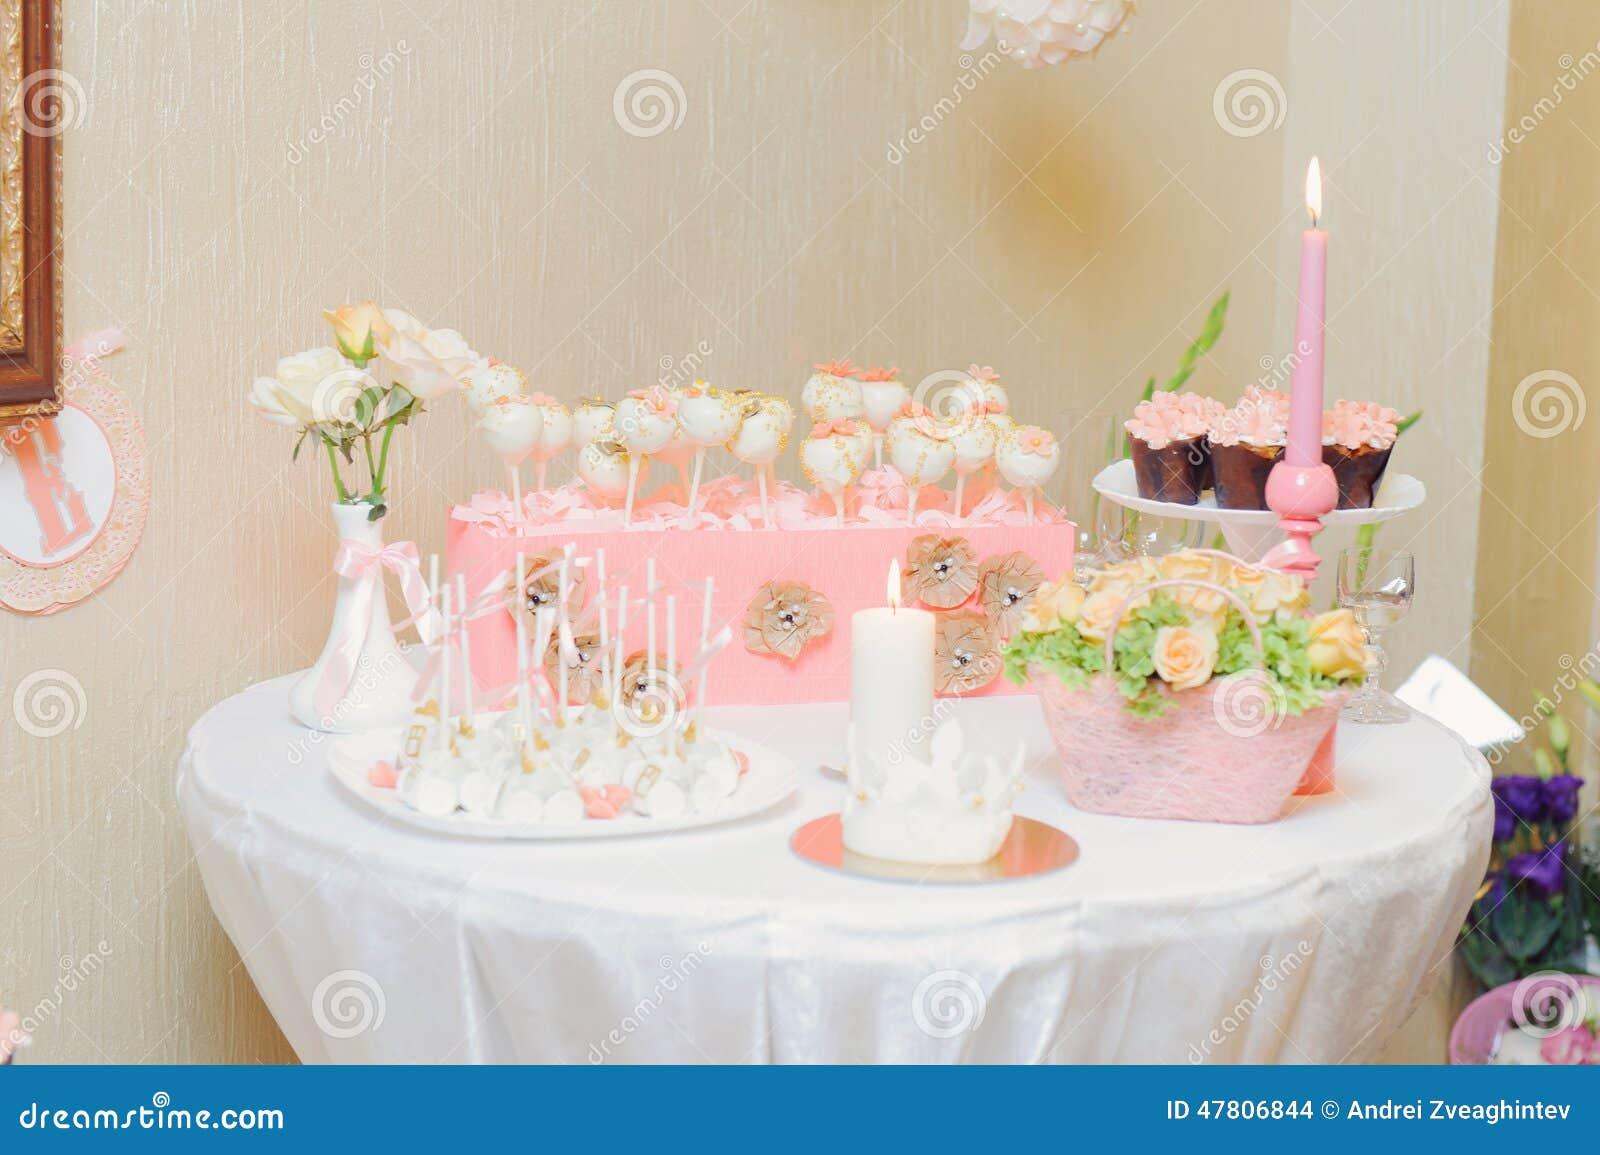 dessert table at restaurant stock photo - image: 47806844